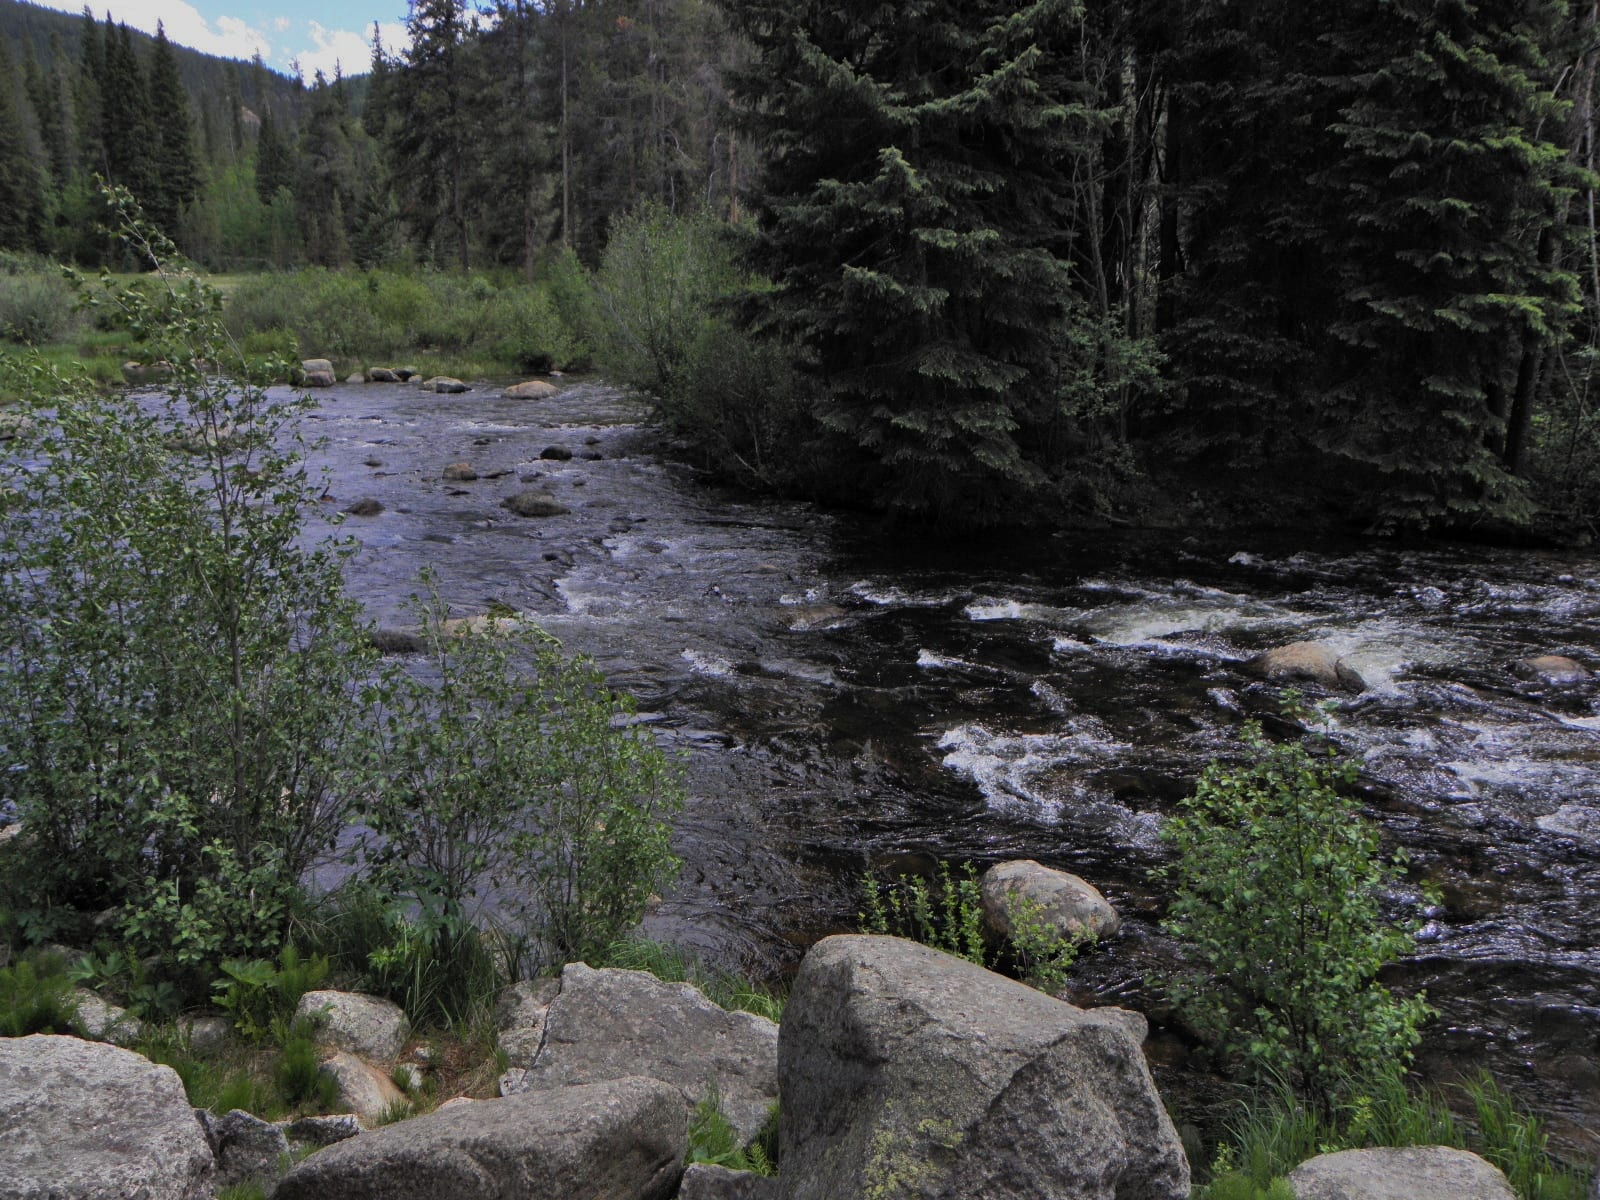 Image of Fryingpan River in Colorado